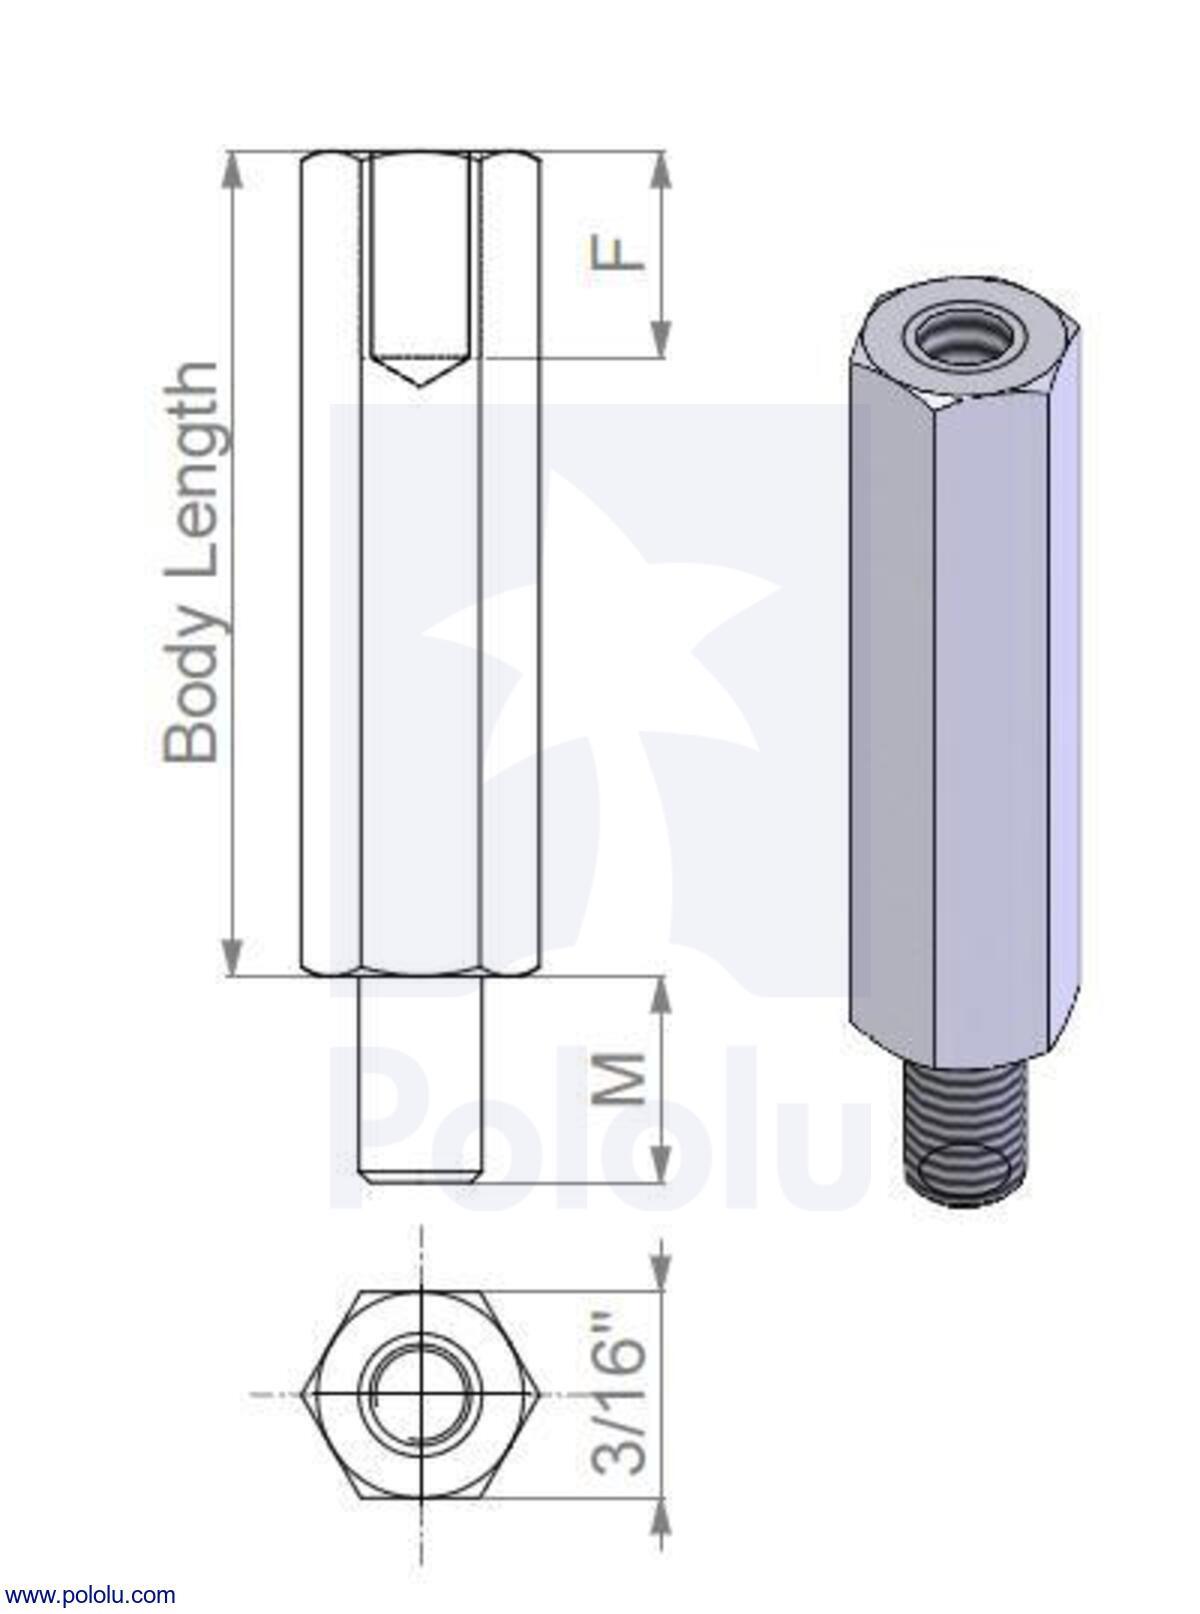 pololu aluminum standoff 1 4 length 2 56 thread m f 4 pack